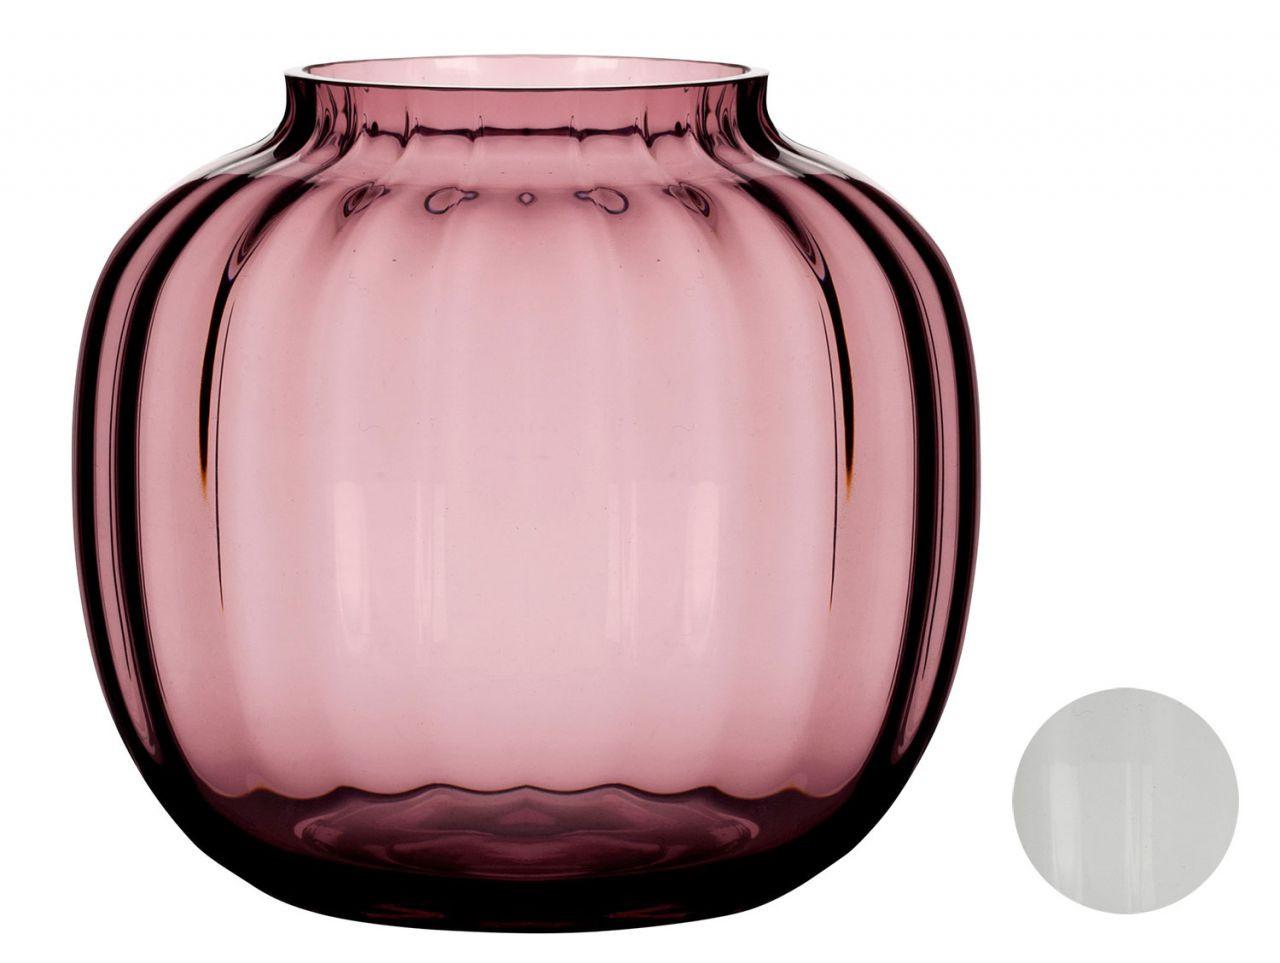 5 glass vase of holmegaard primula vase height 145 cm scandinavian lifestyle pertaining to 5706422102982 v 0001 1280x1280